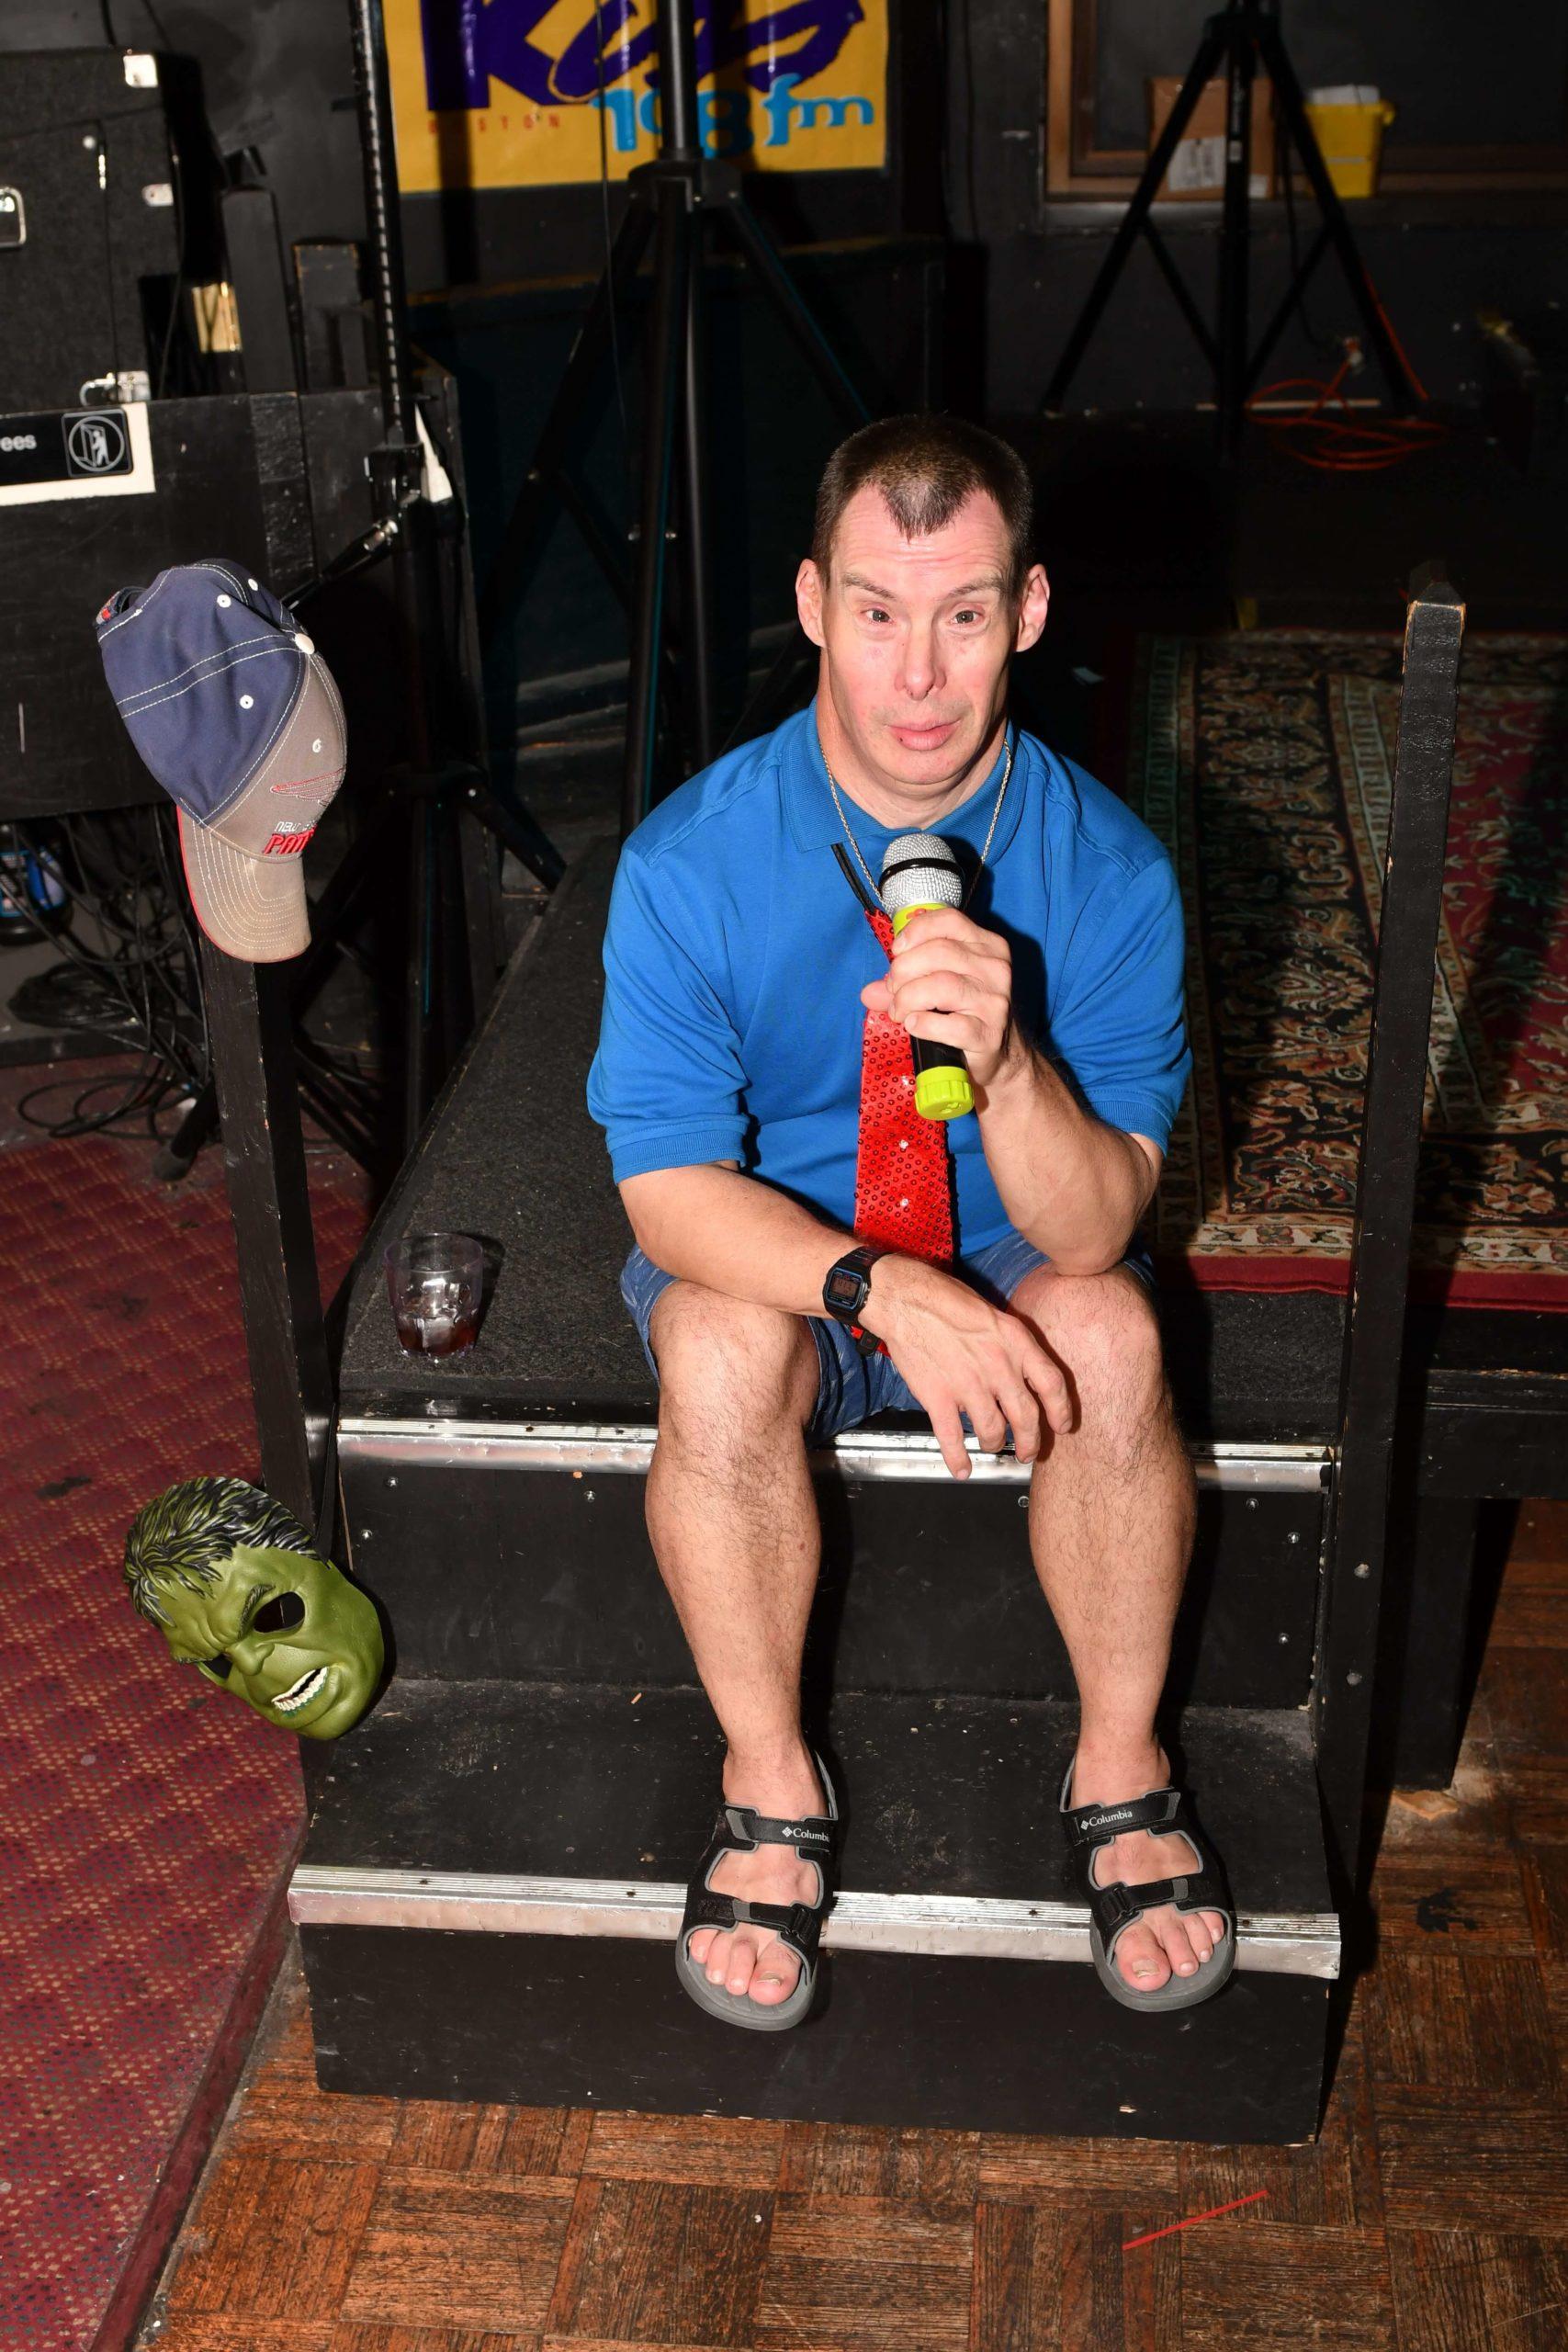 thrive participant doing karaoke